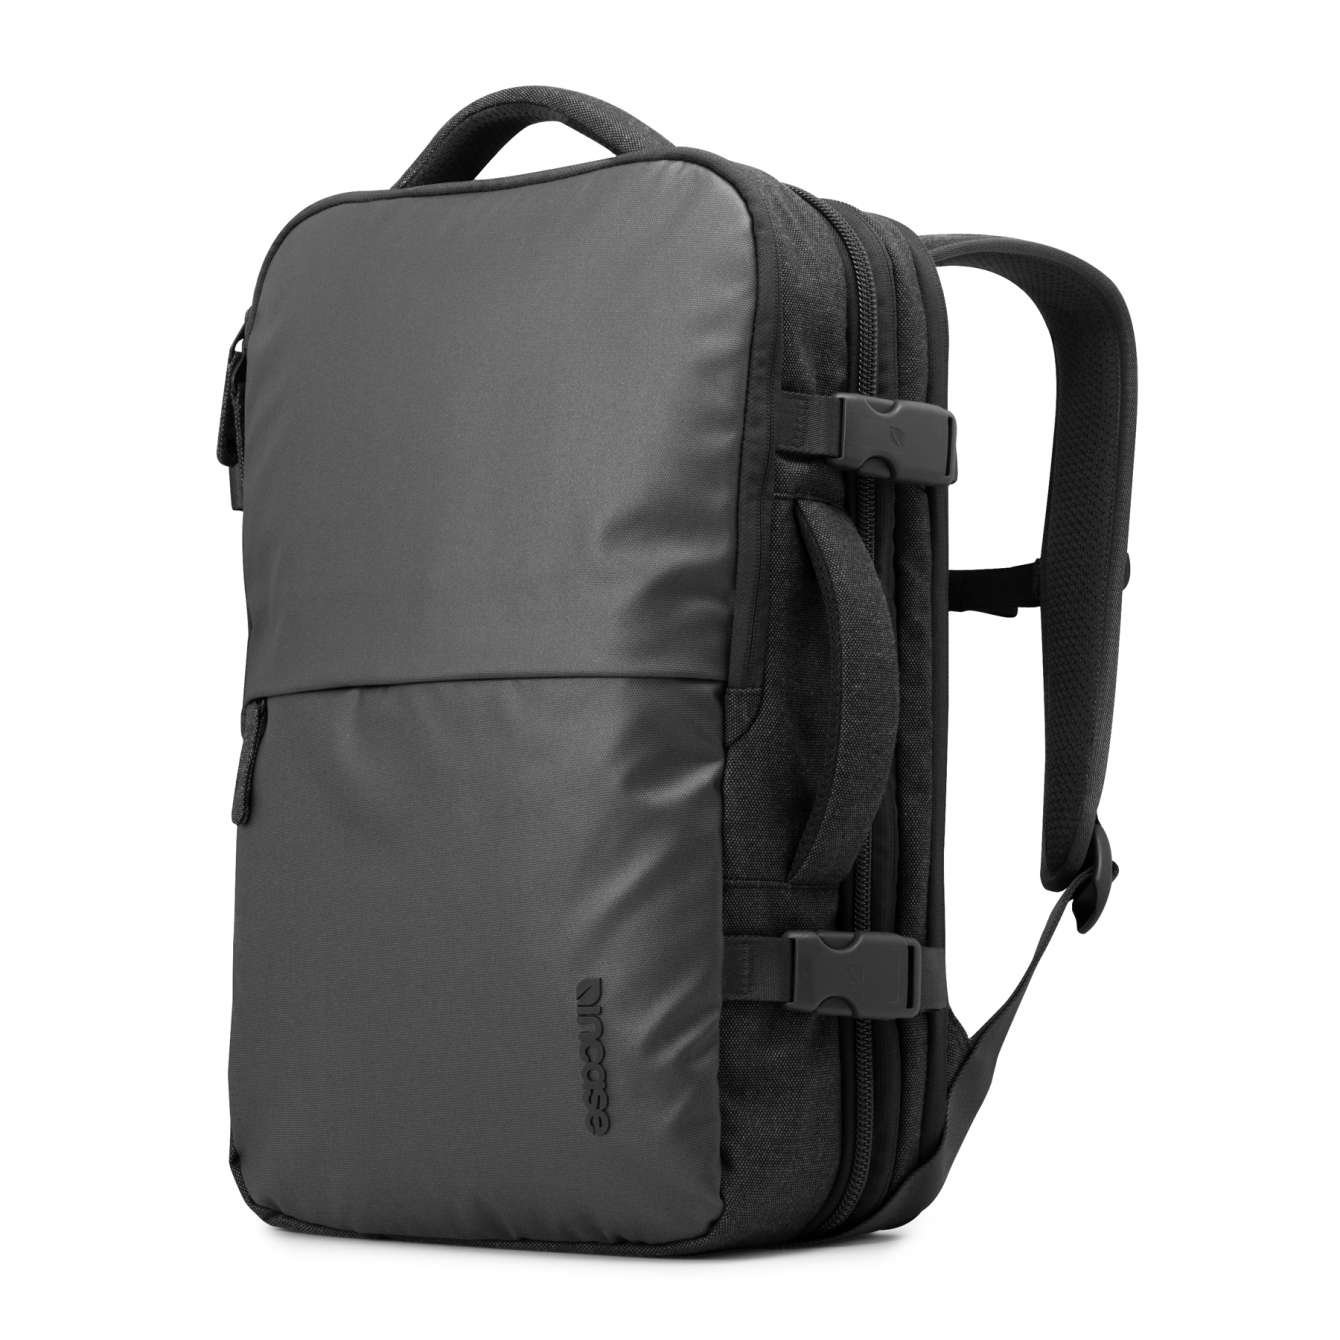 Incase Men's Travel Backpack, Black, One Size